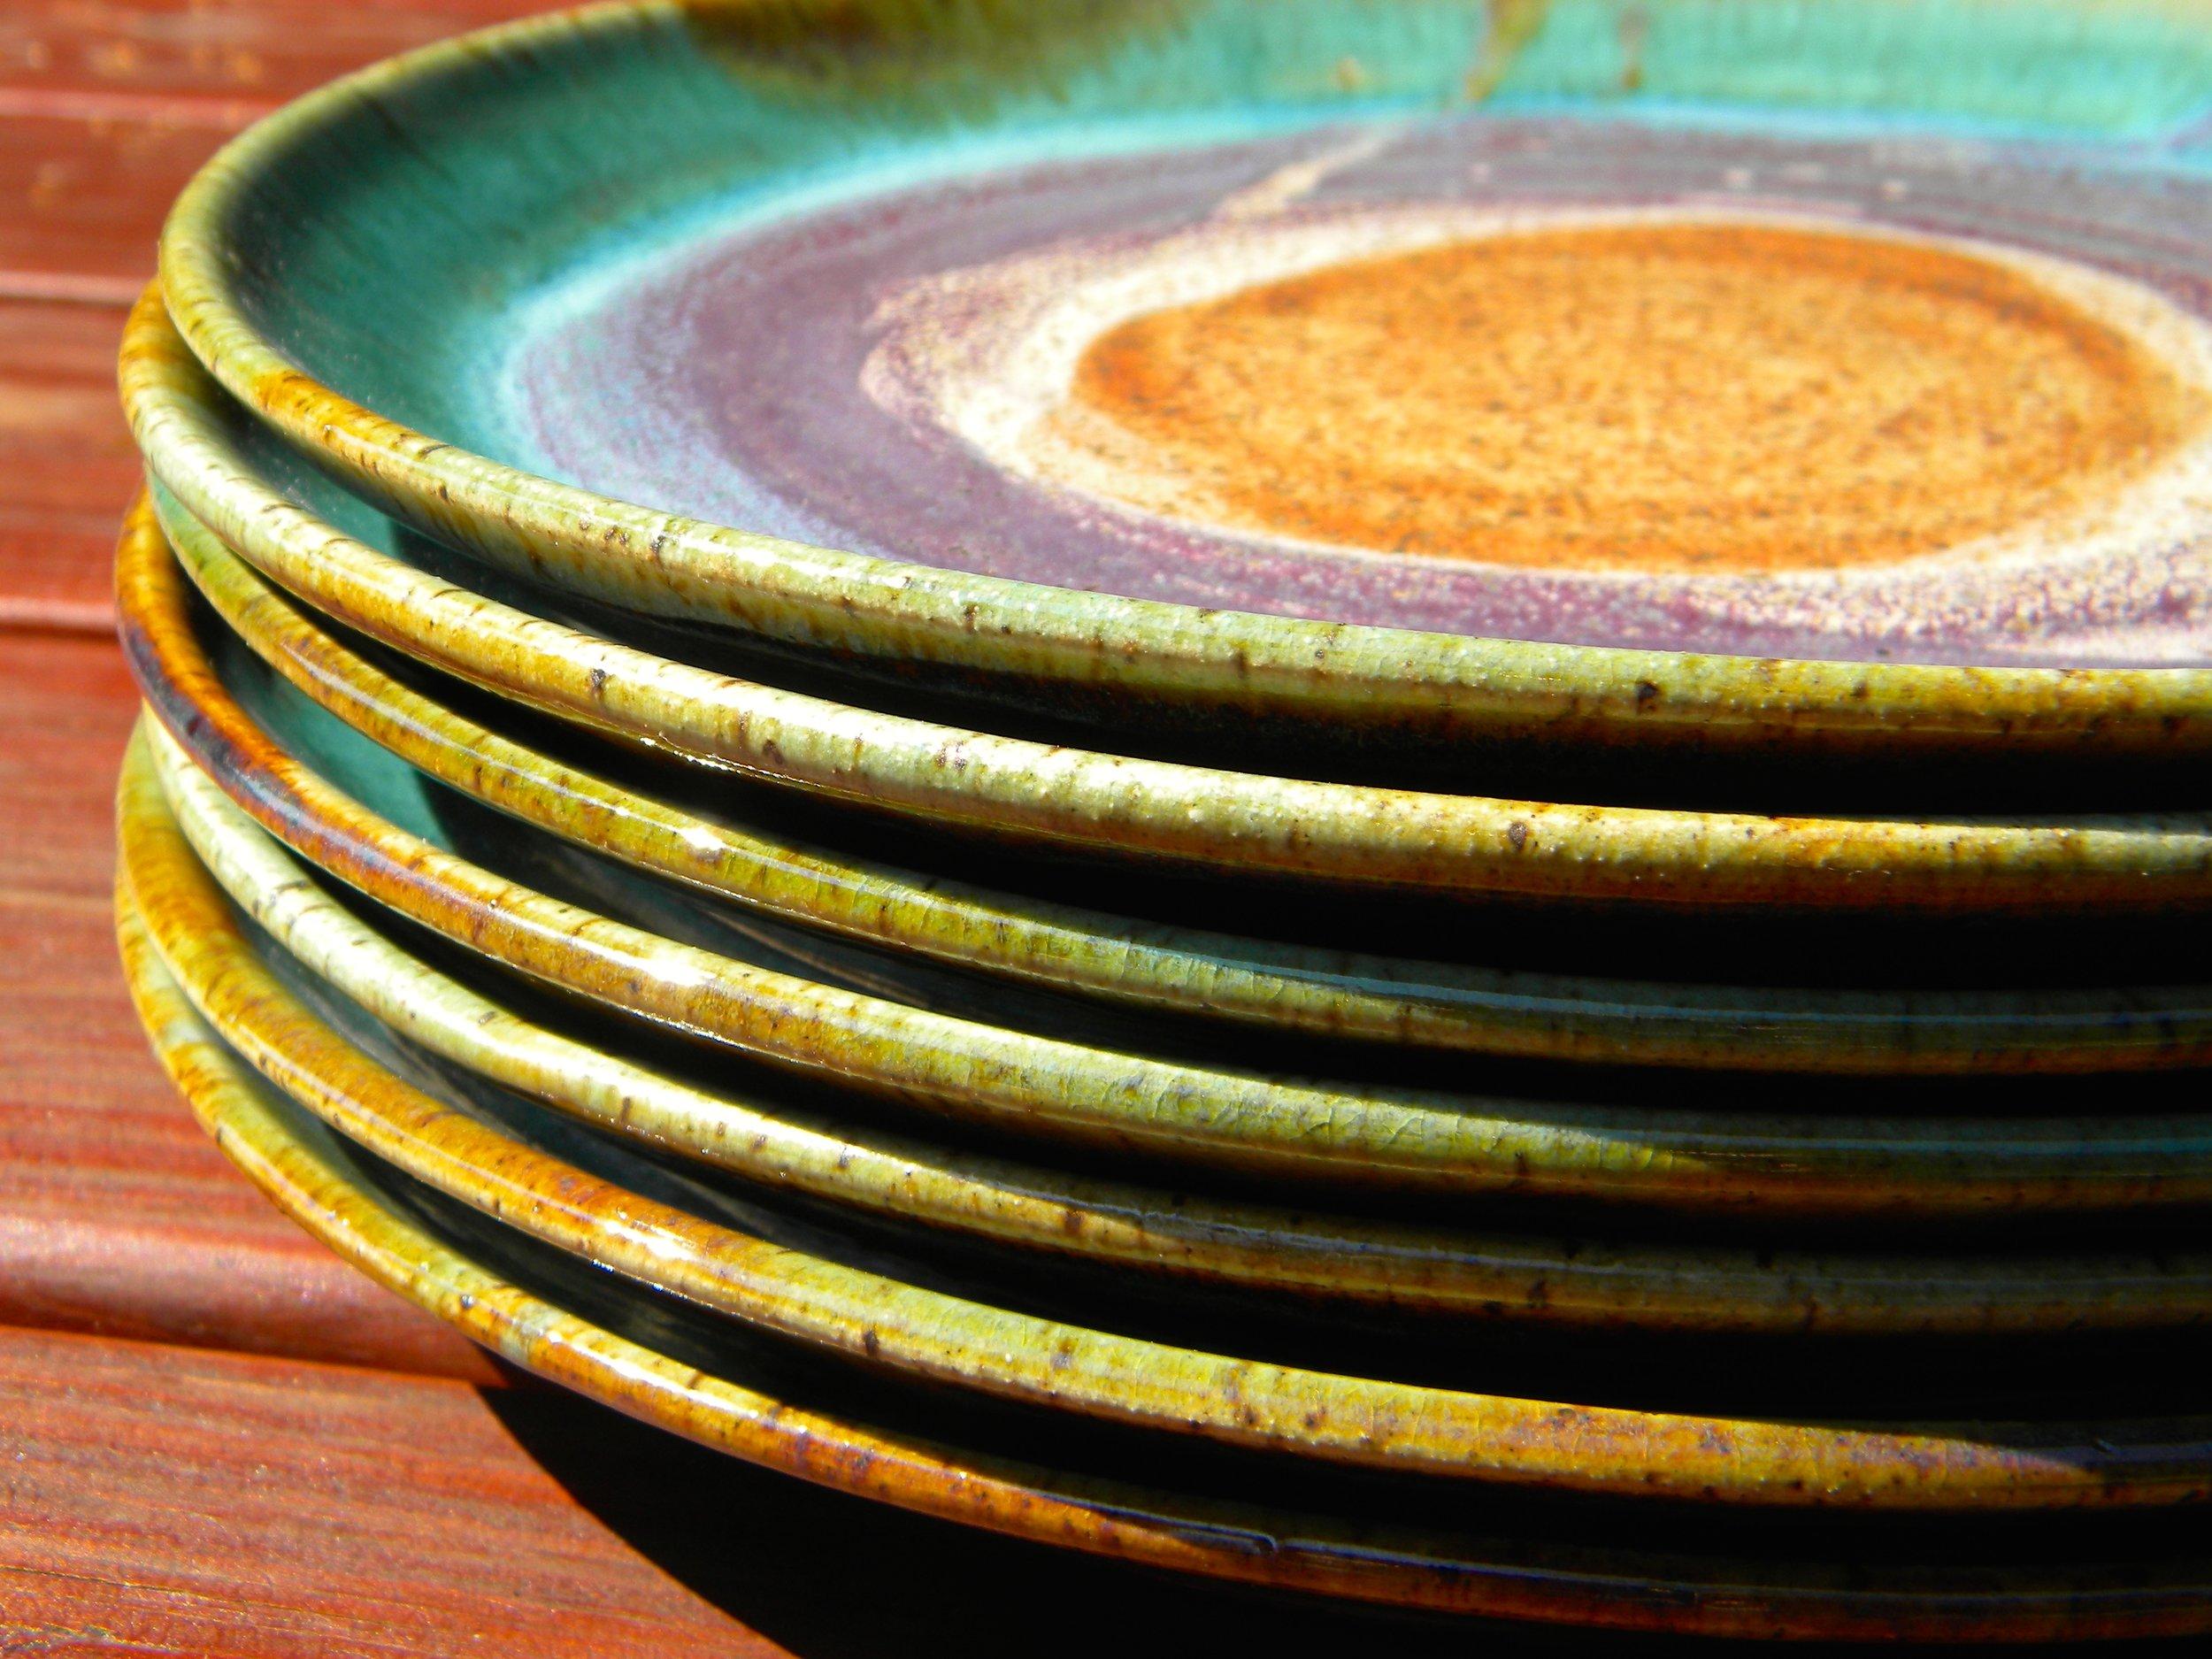 Amrita Lash Pottery